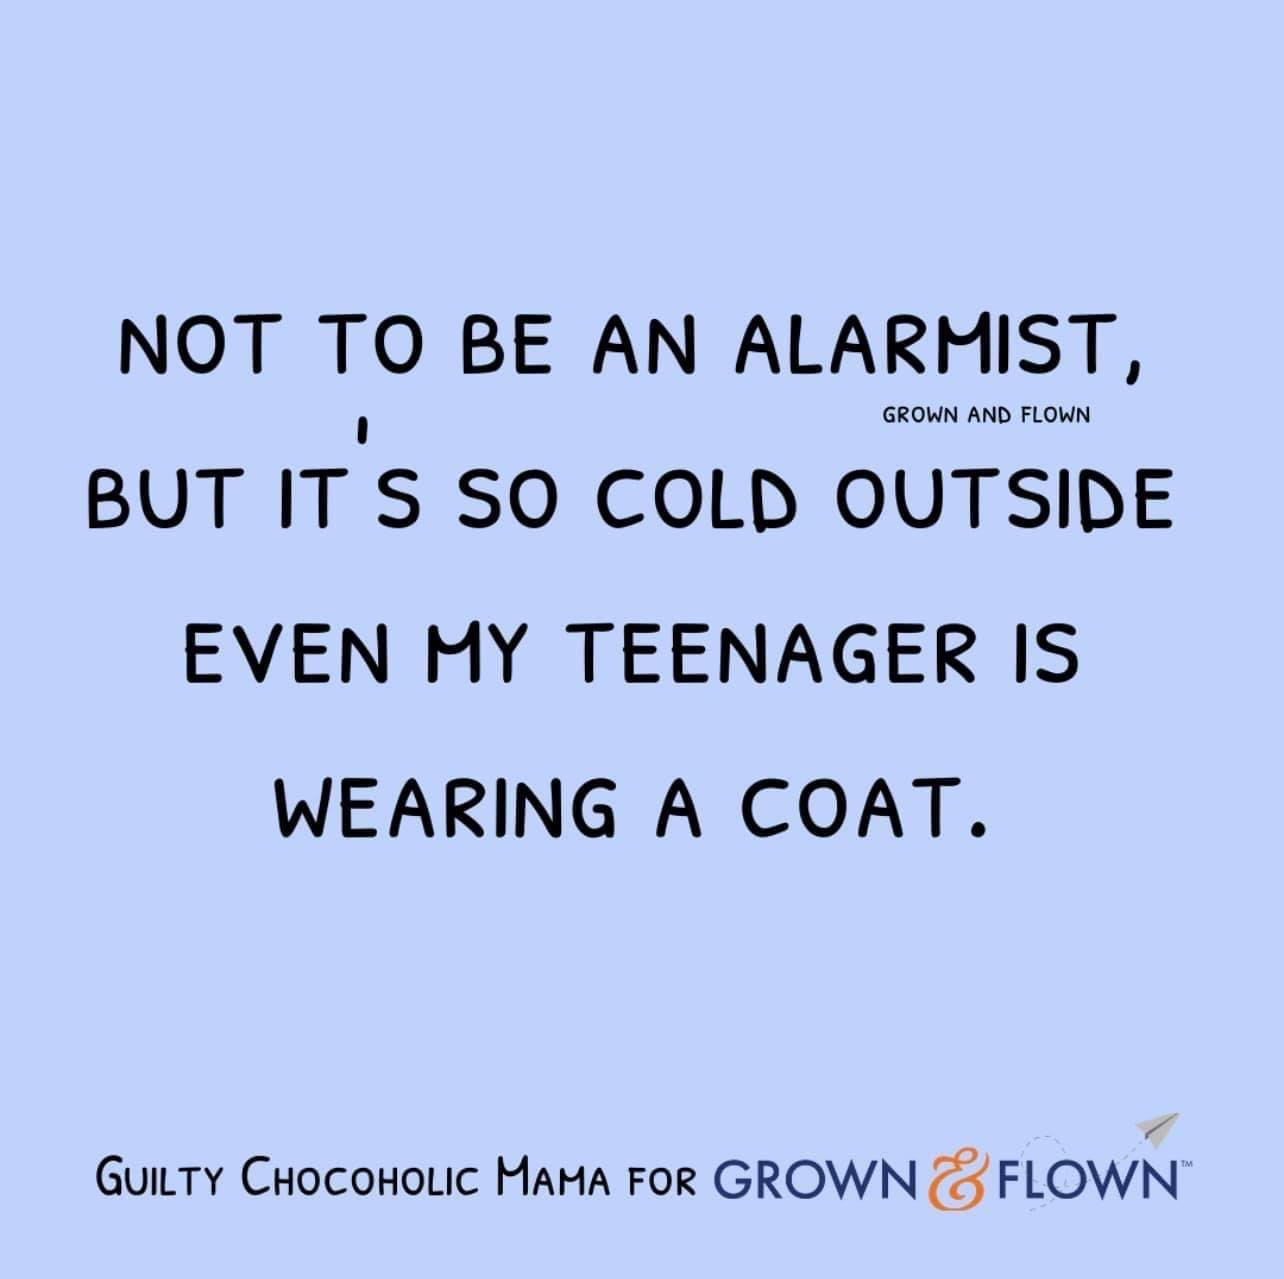 teenager wearing coat meme